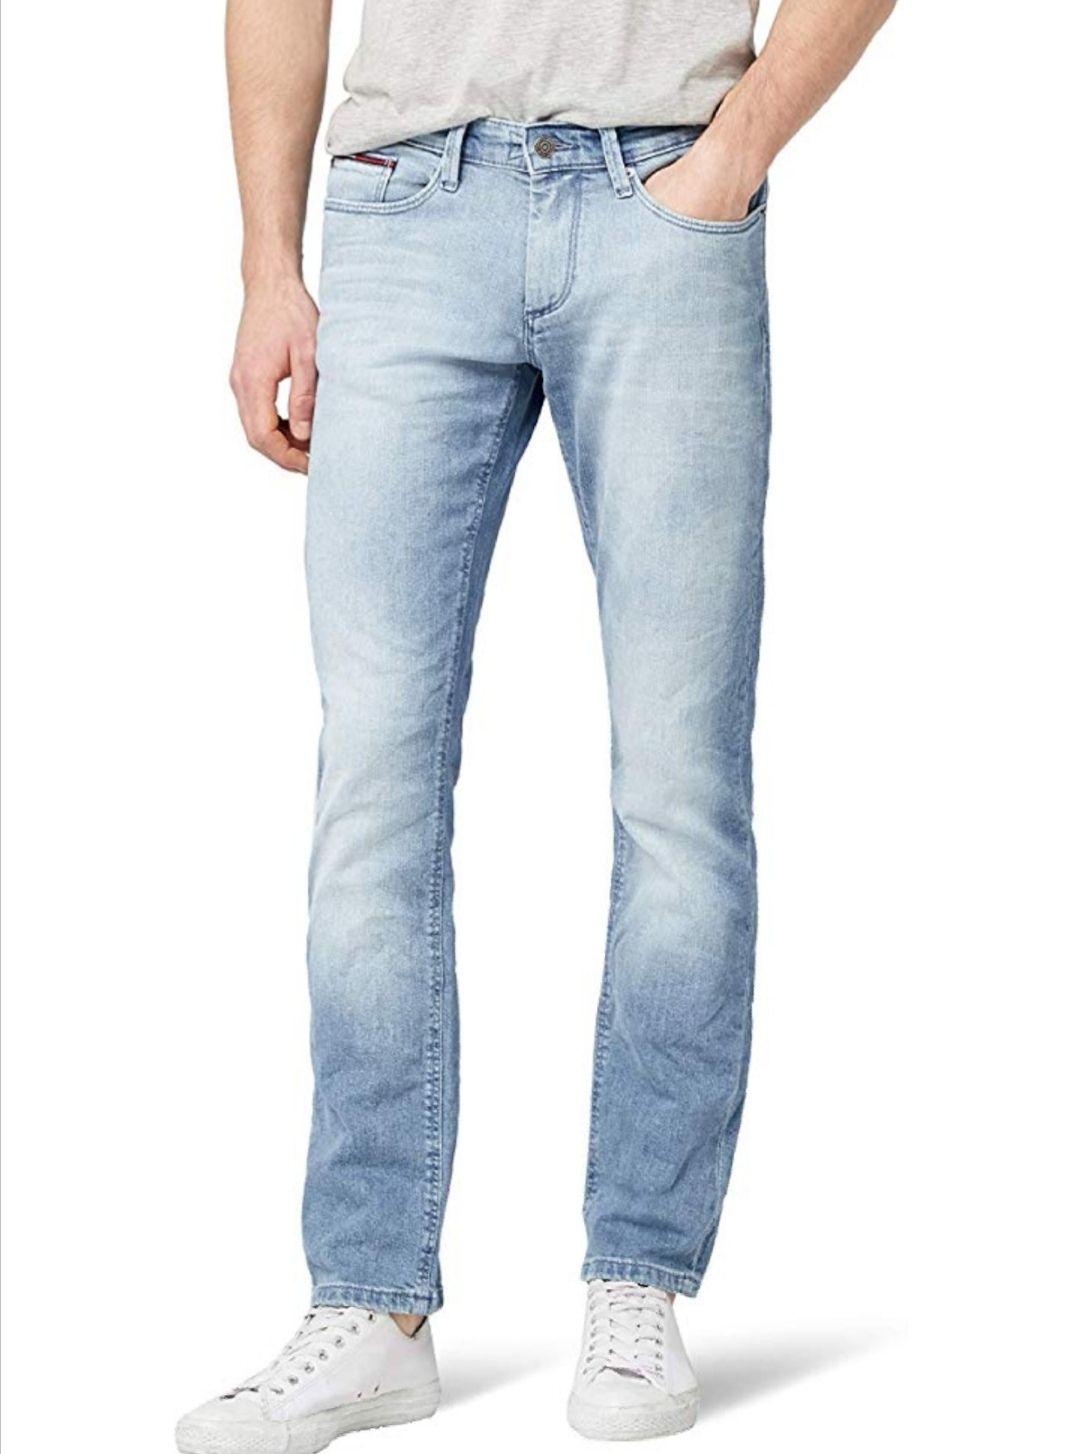 Tommy Jeans vaqueros hombre.